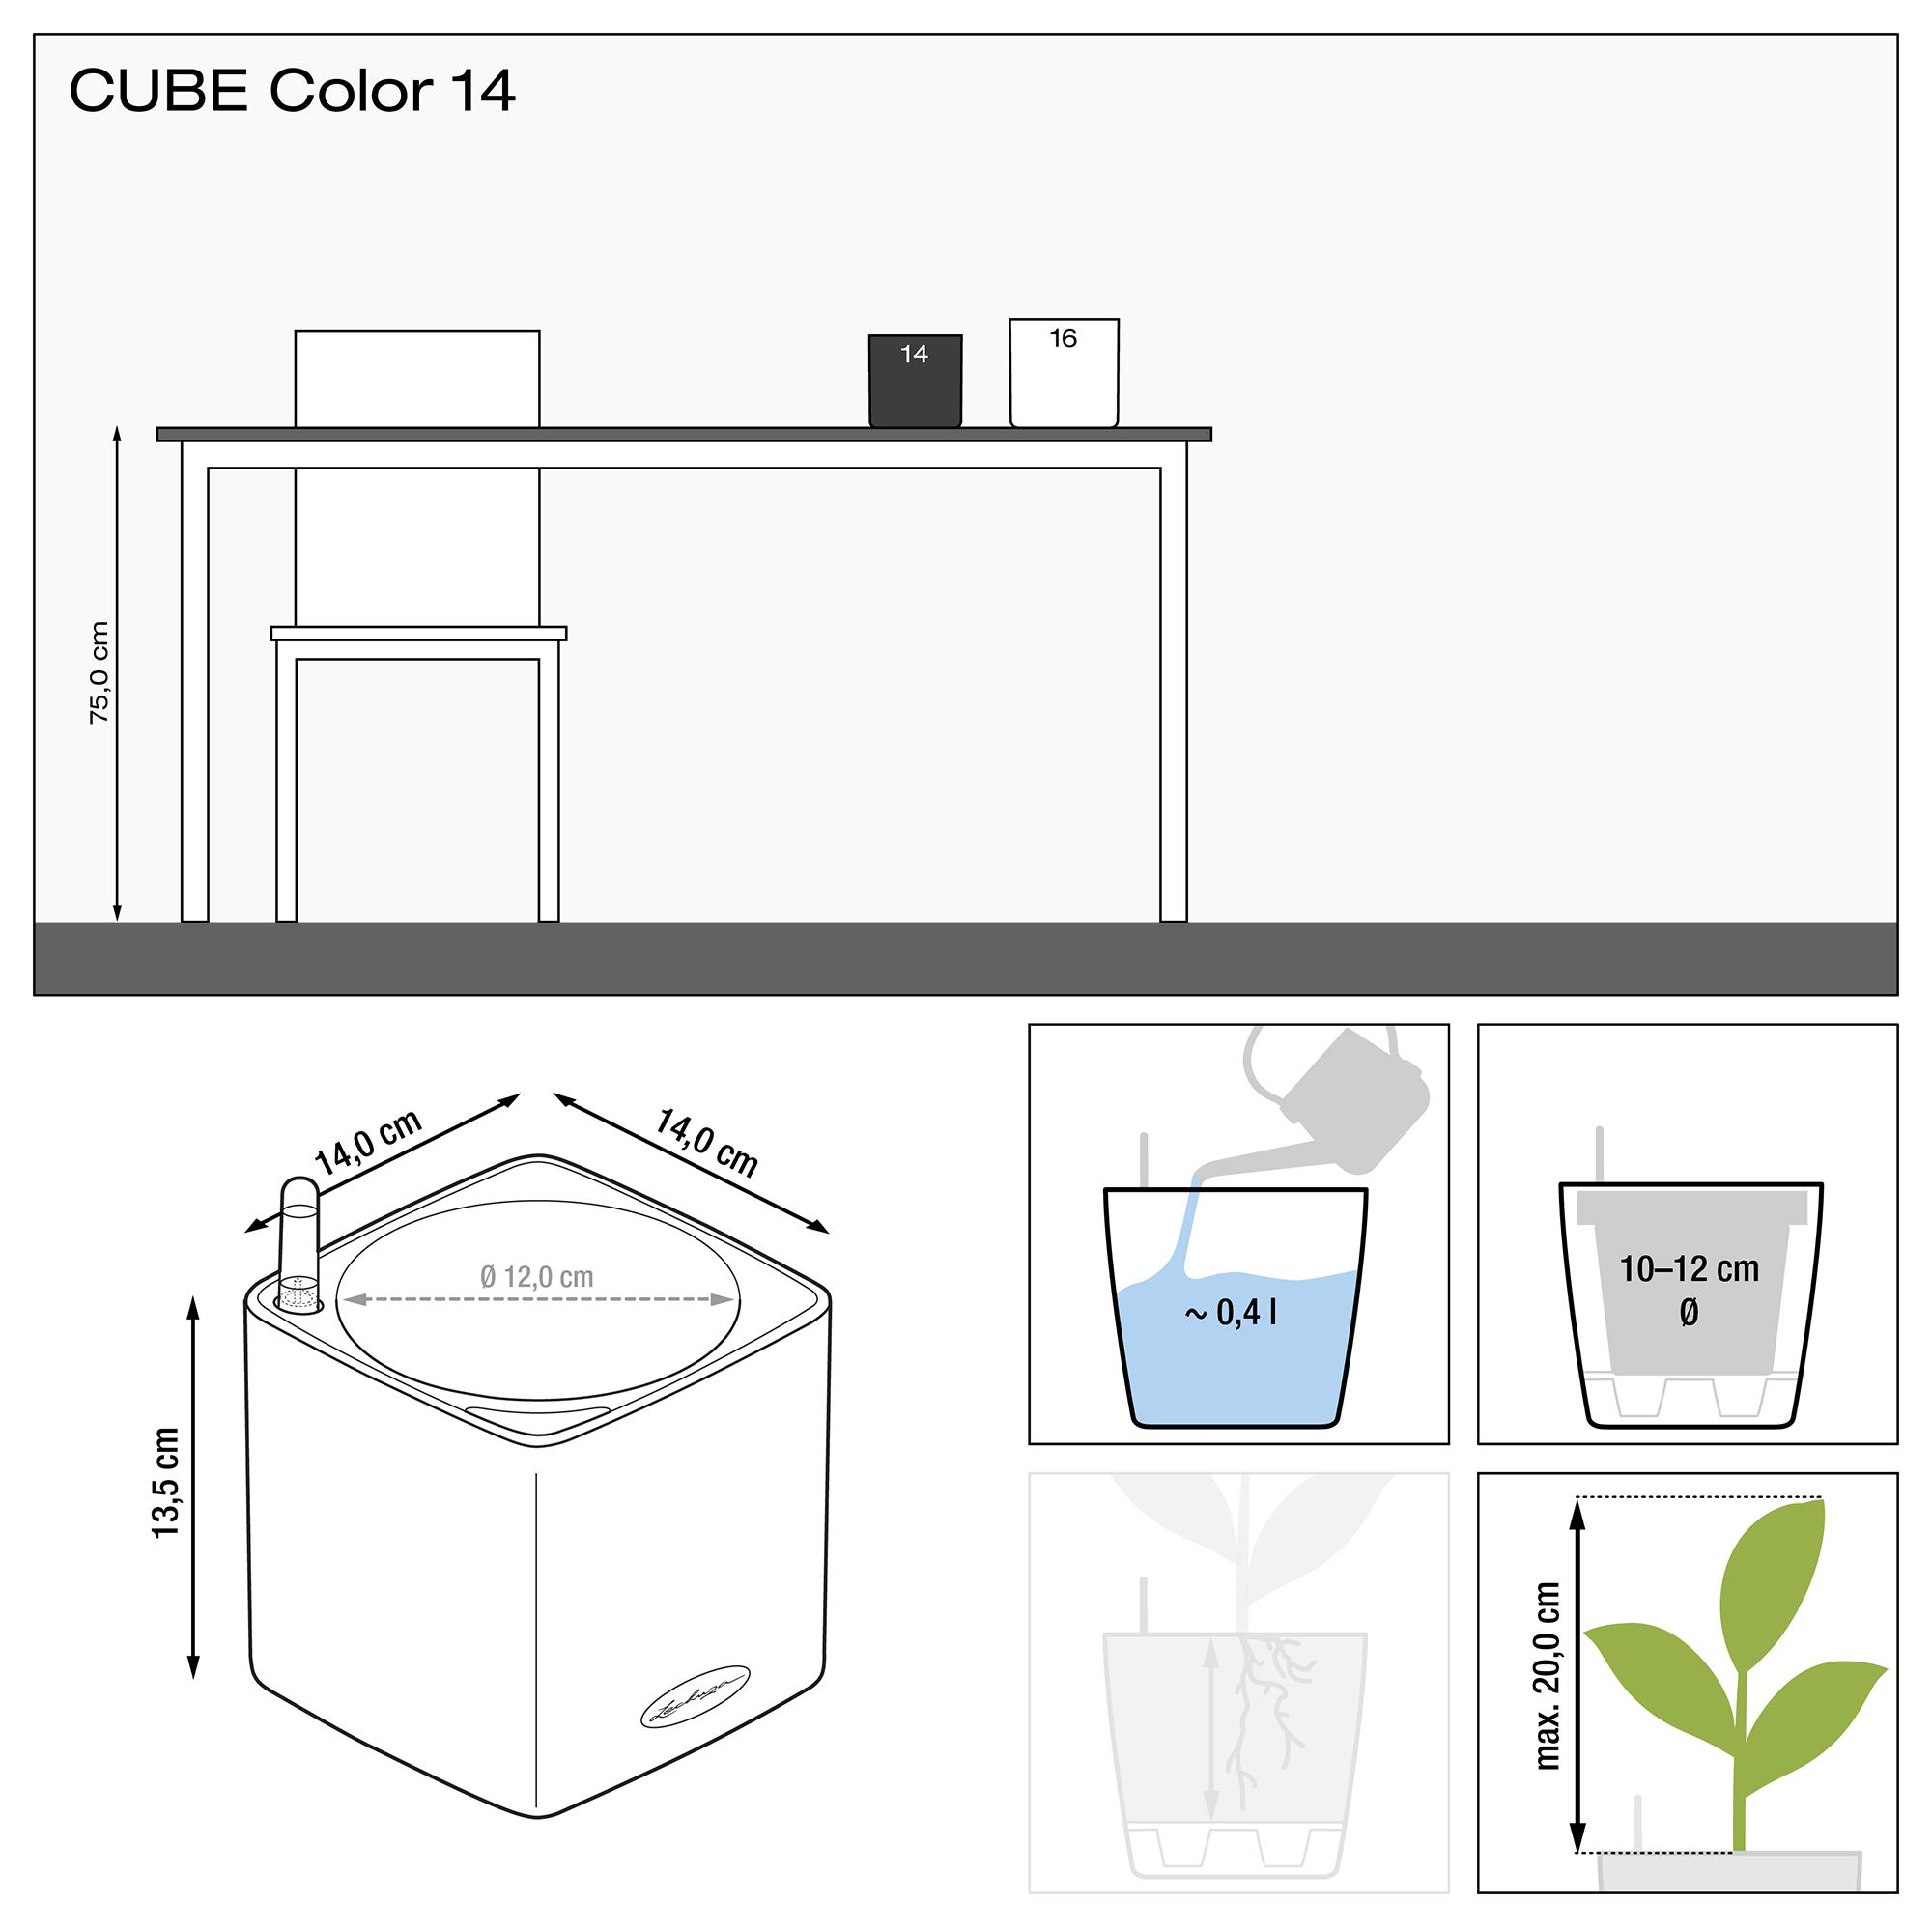 CUBE Color 14 blanc - Image 2